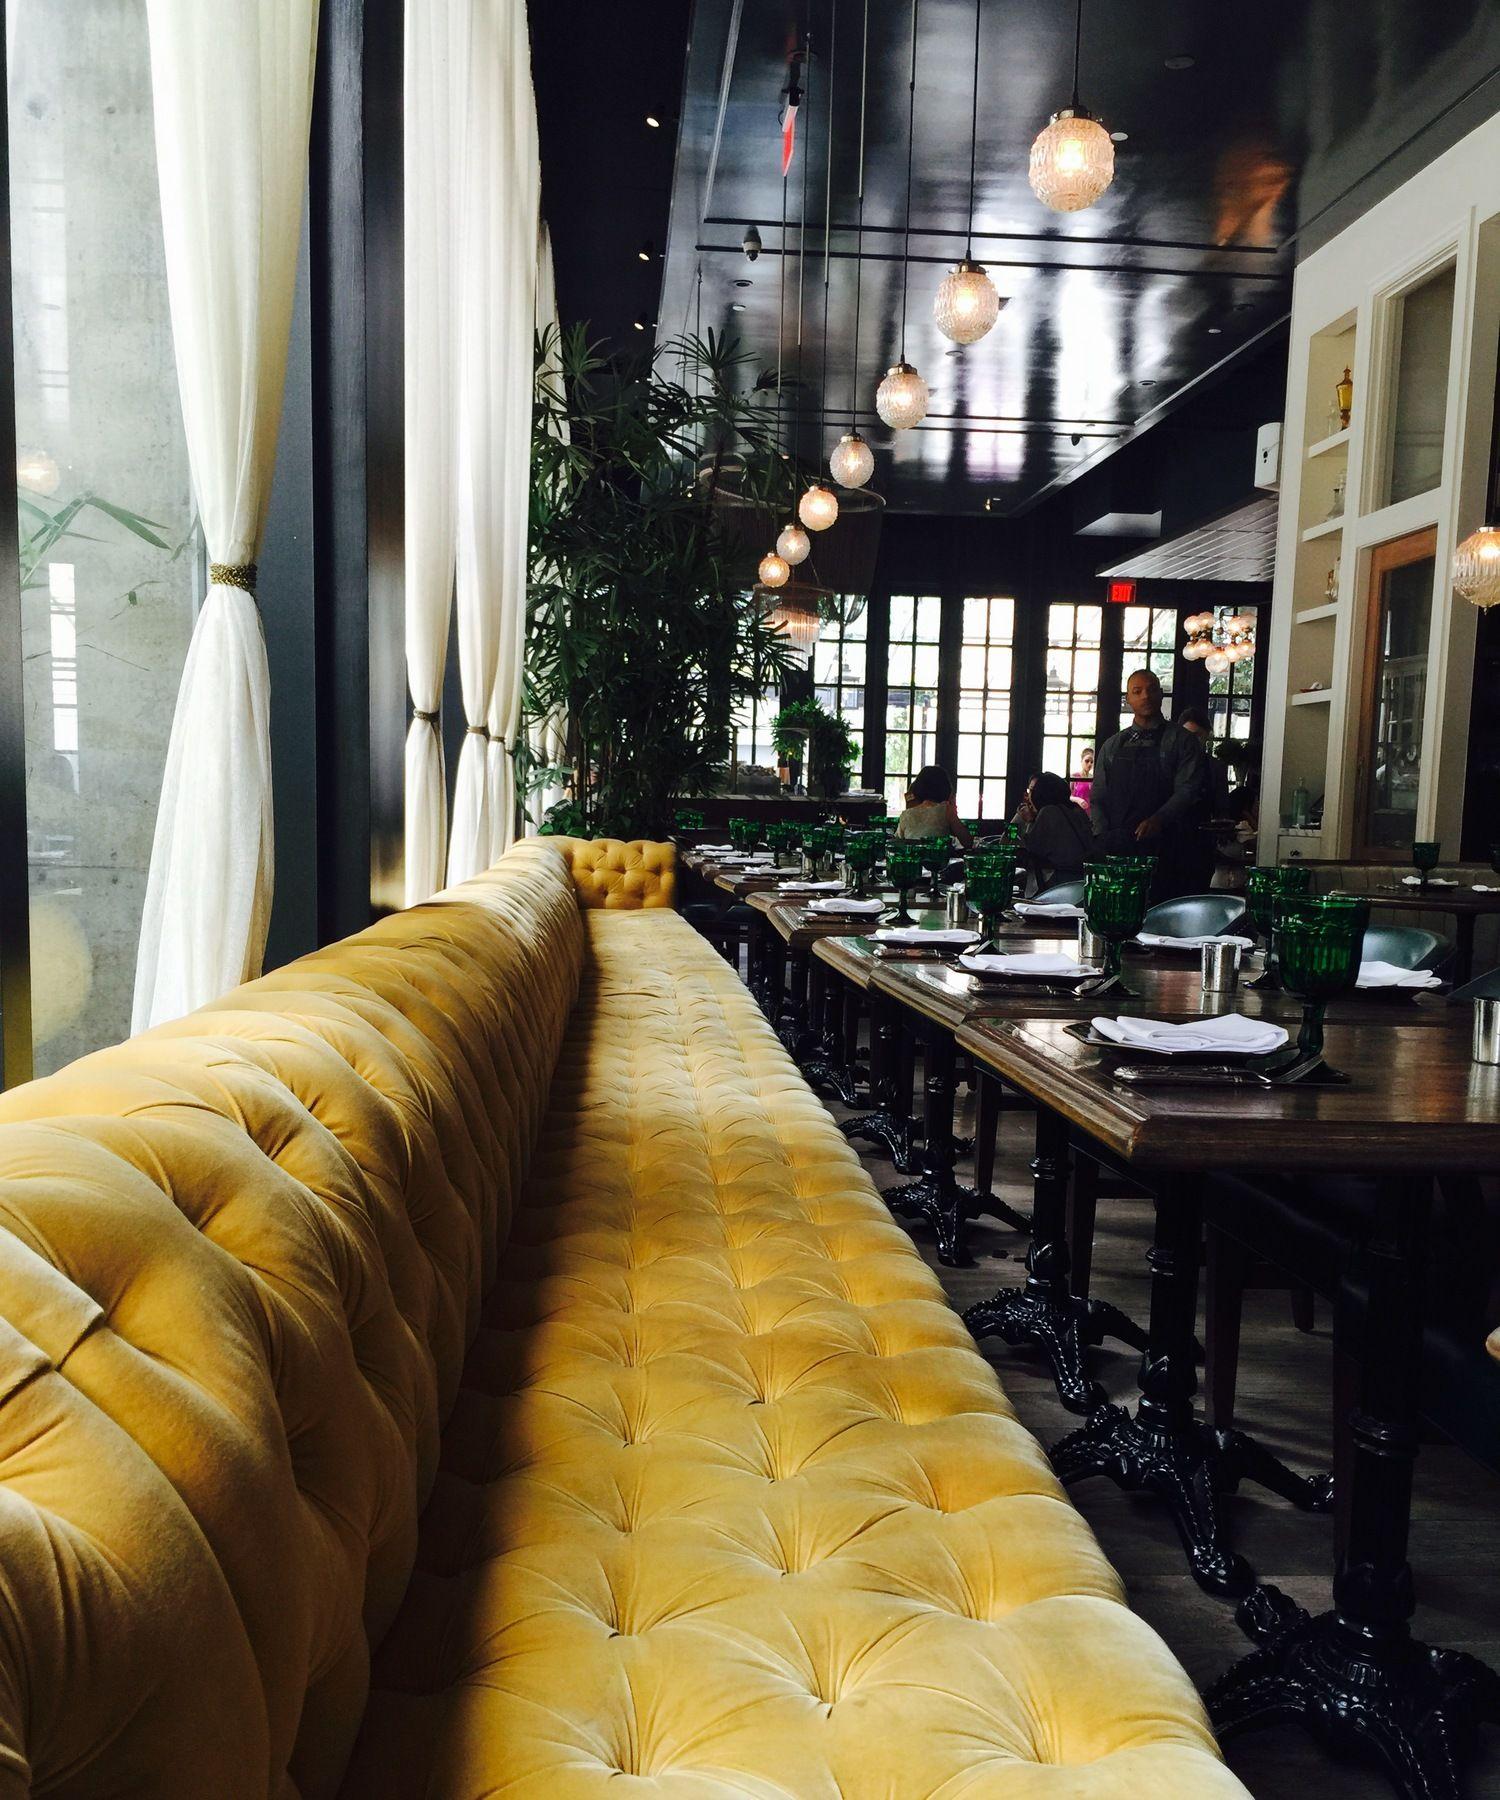 Tour Faith Flower One Of America S Best Designed Decorated Restaurants Designed Restaurant Banquette Restaurant Interior Design Restaurant Interior